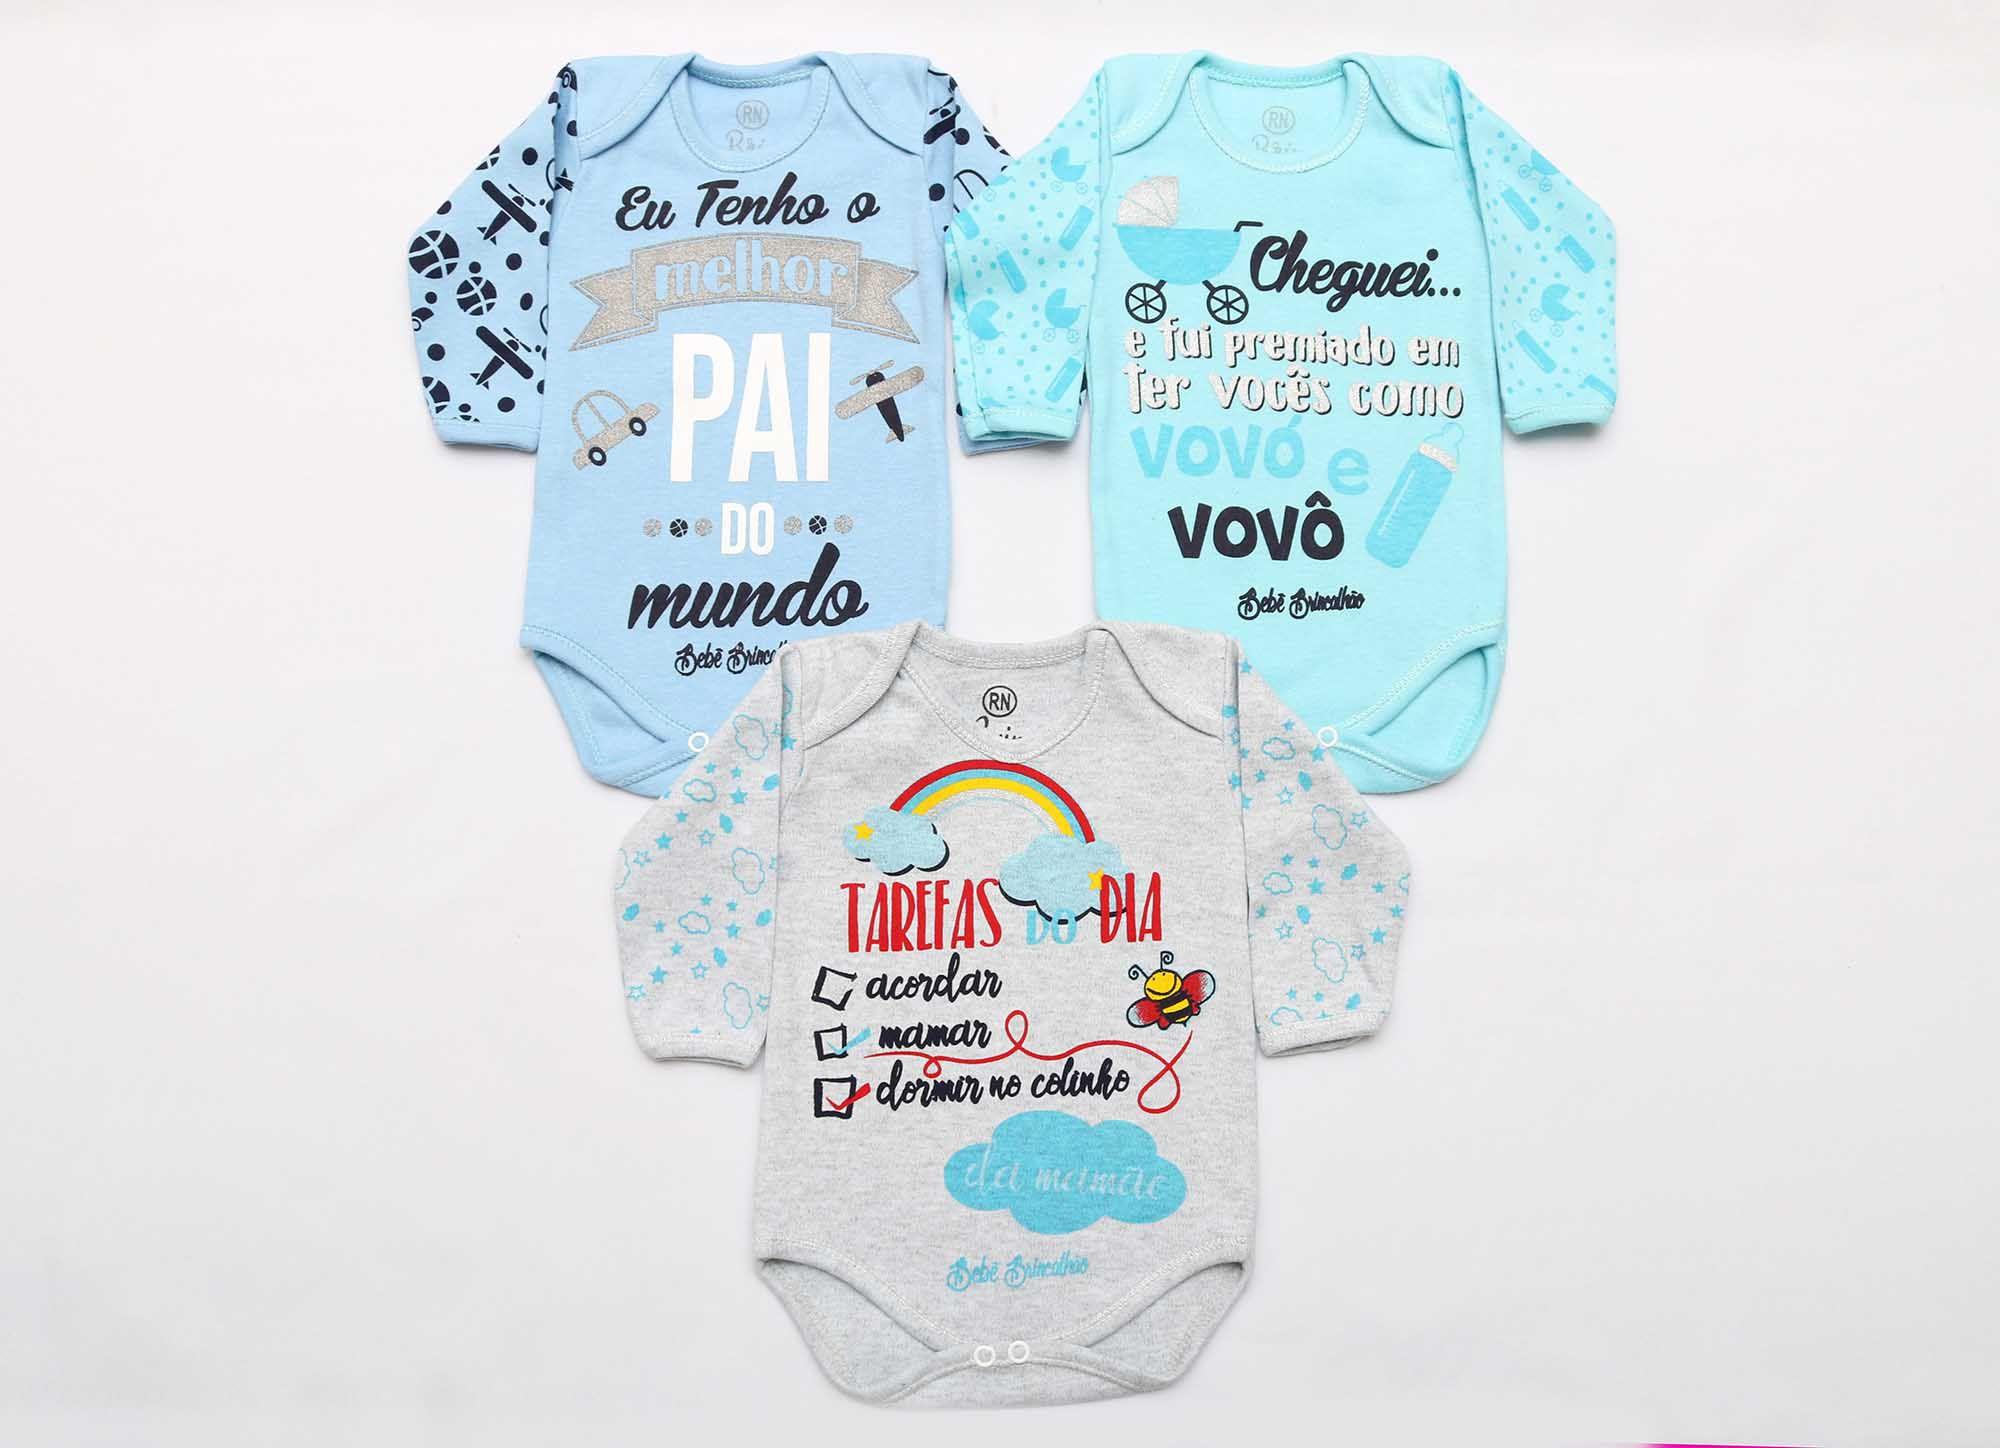 Kit Body Bebê 3 Peças Menino Mescla, Azul e Azul Água Tarefas